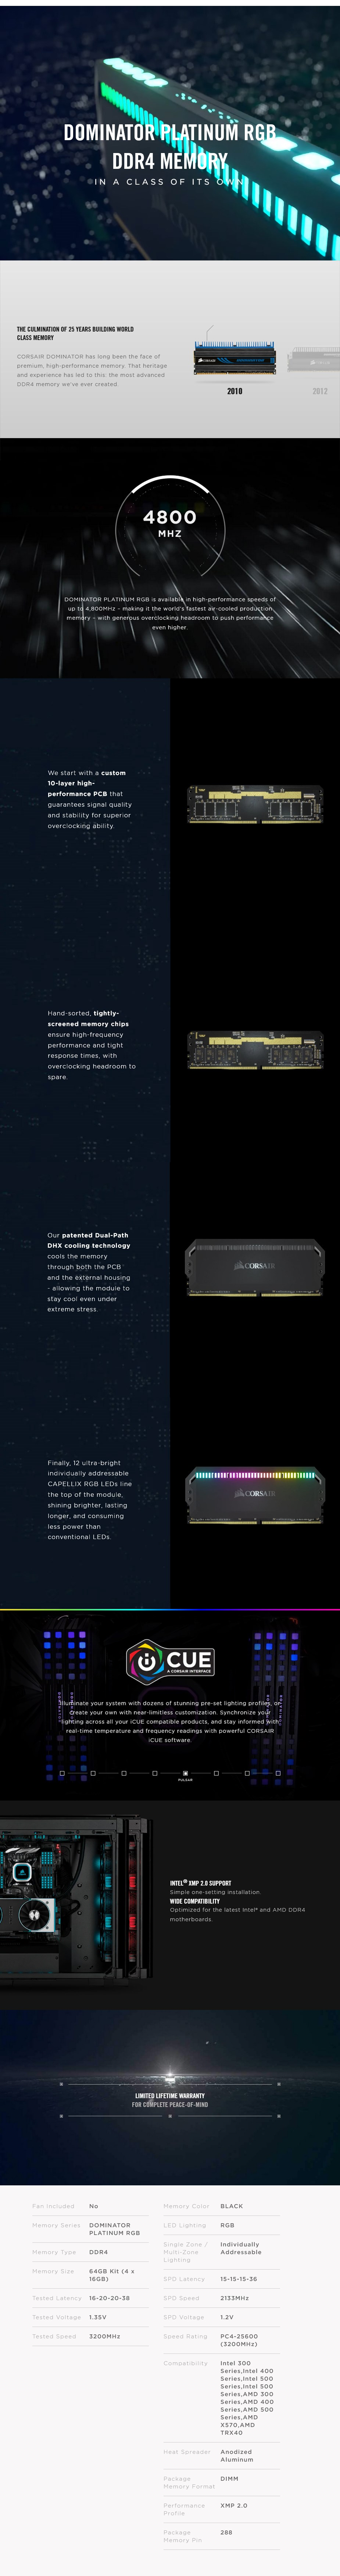 corsair-dominator-platinum-rgb-64gb-4x-16gb-ddr4-3200mhz-memory-black-ac42961-4.jpg